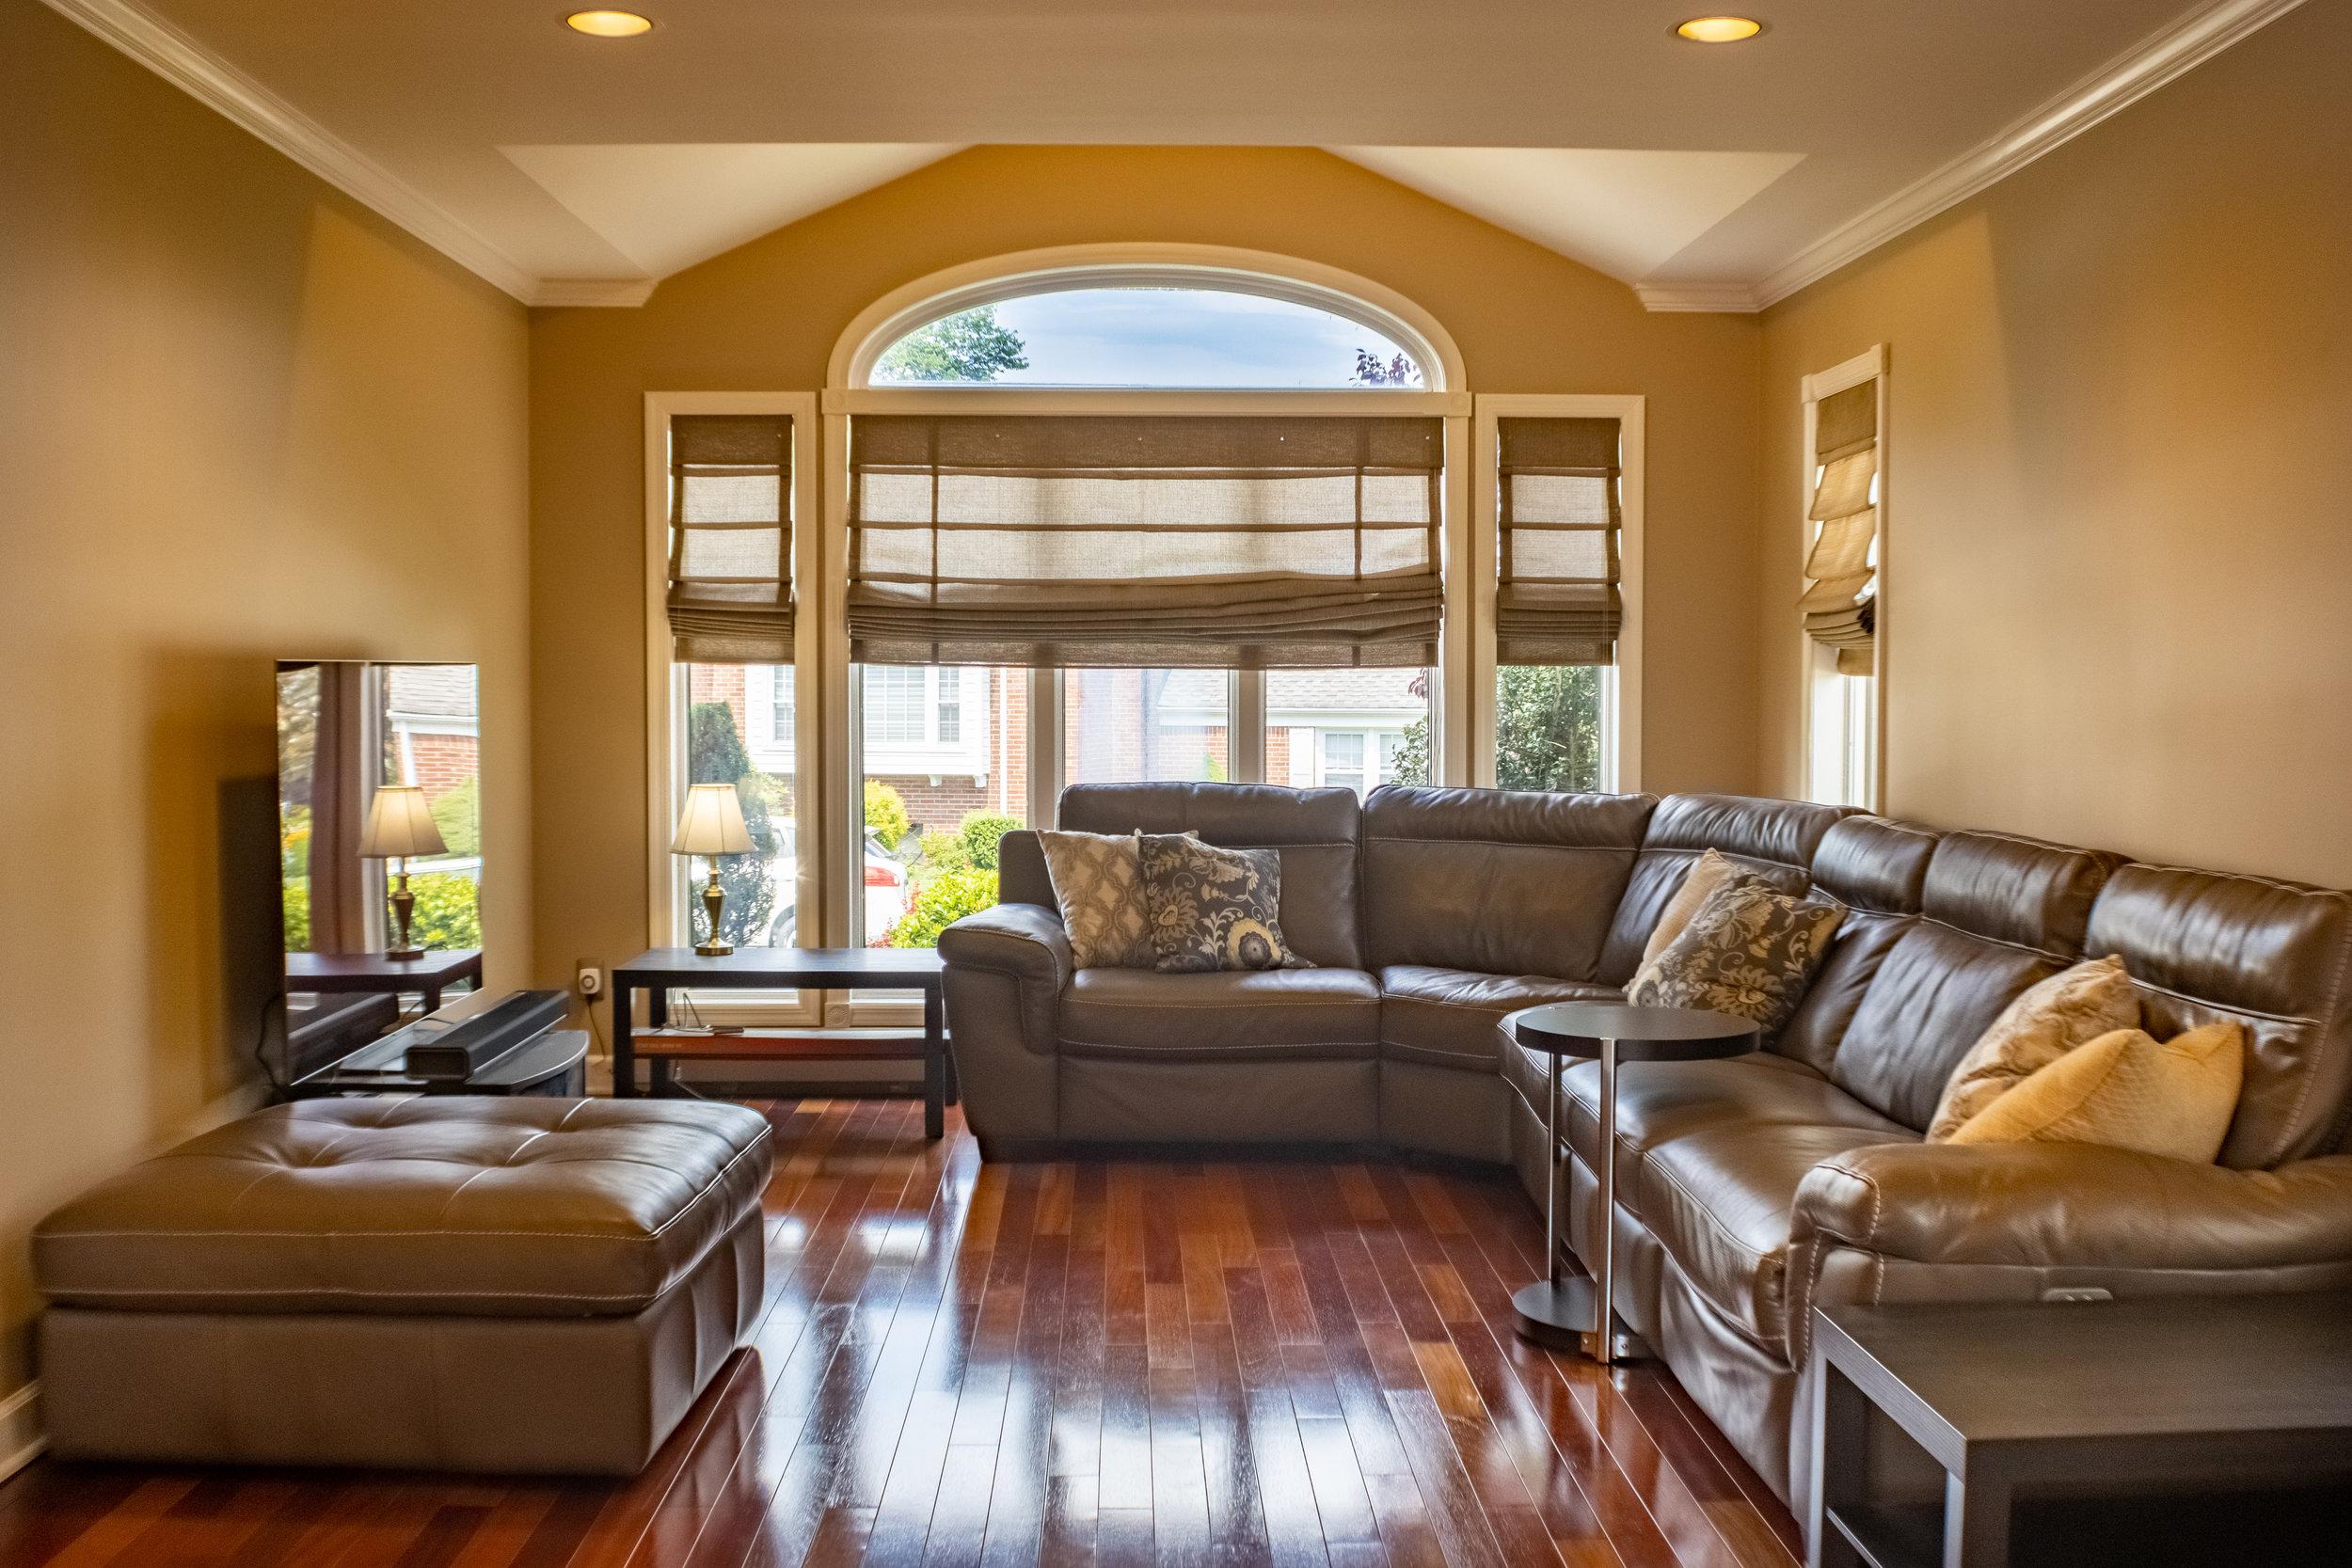 livingroomlarger.jpg